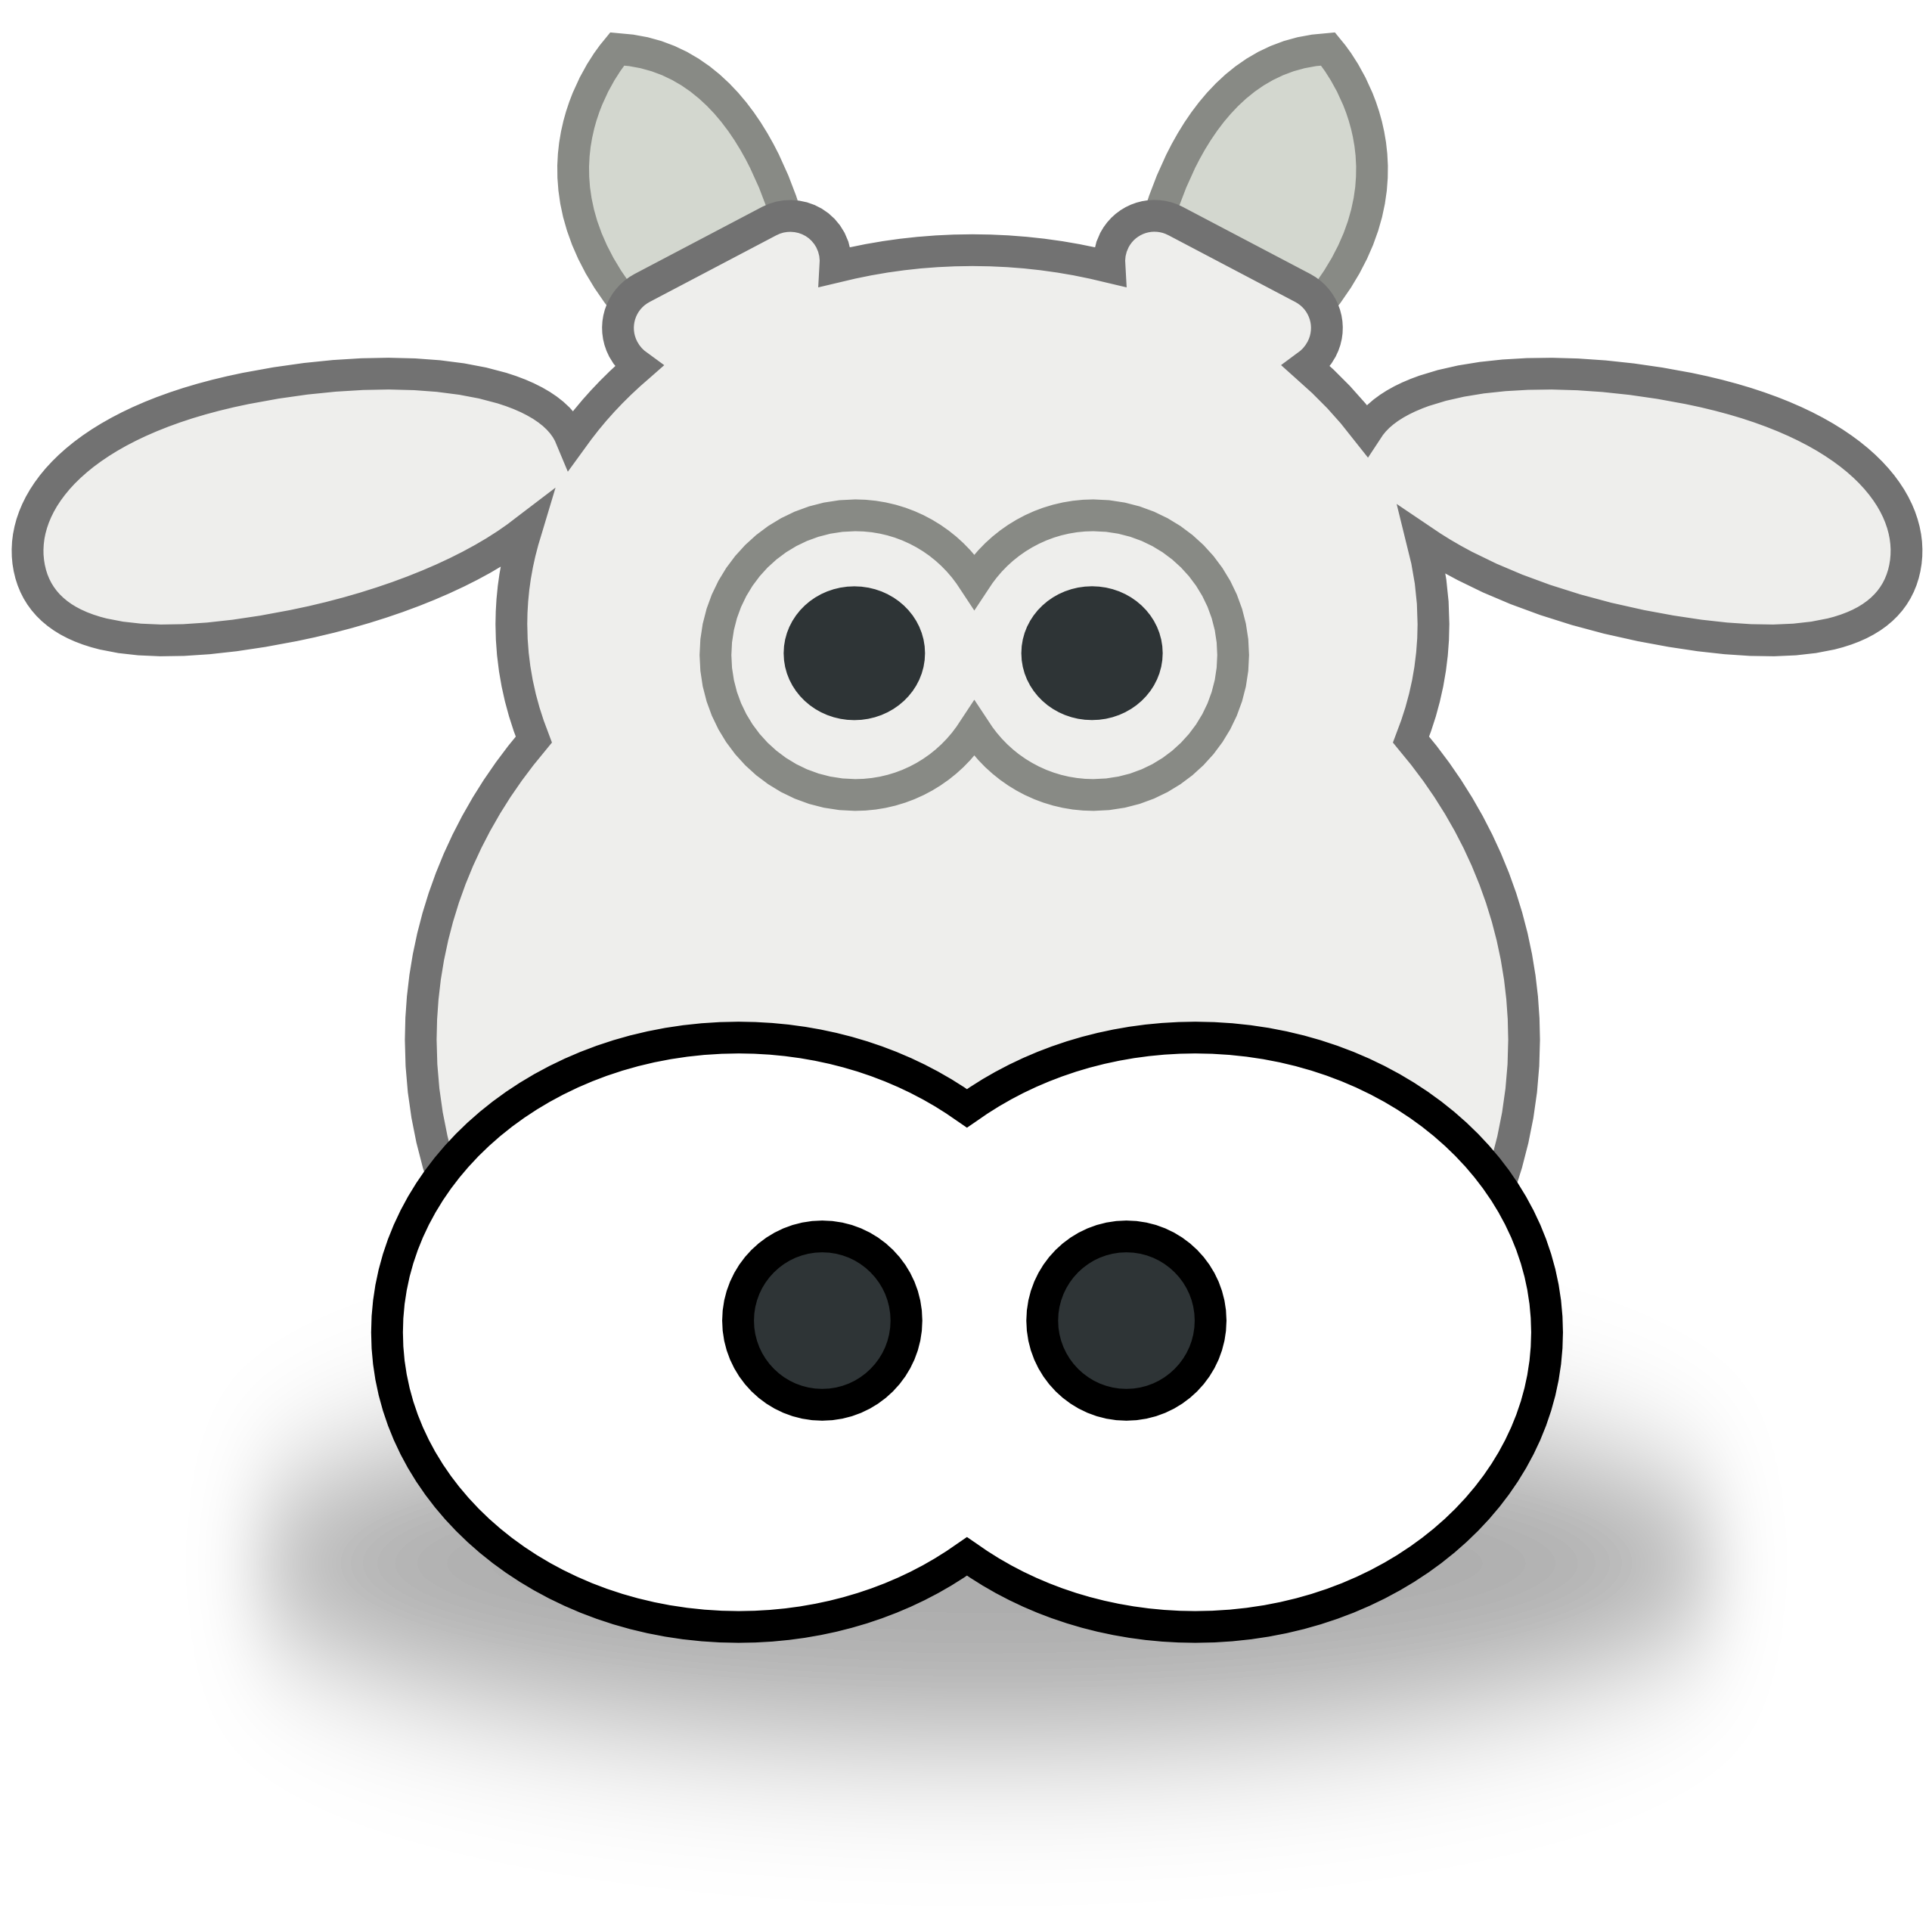 cow head clipart clipart panda free clipart images rh clipartpanda com cartoon cow head clip art cow head clip art free